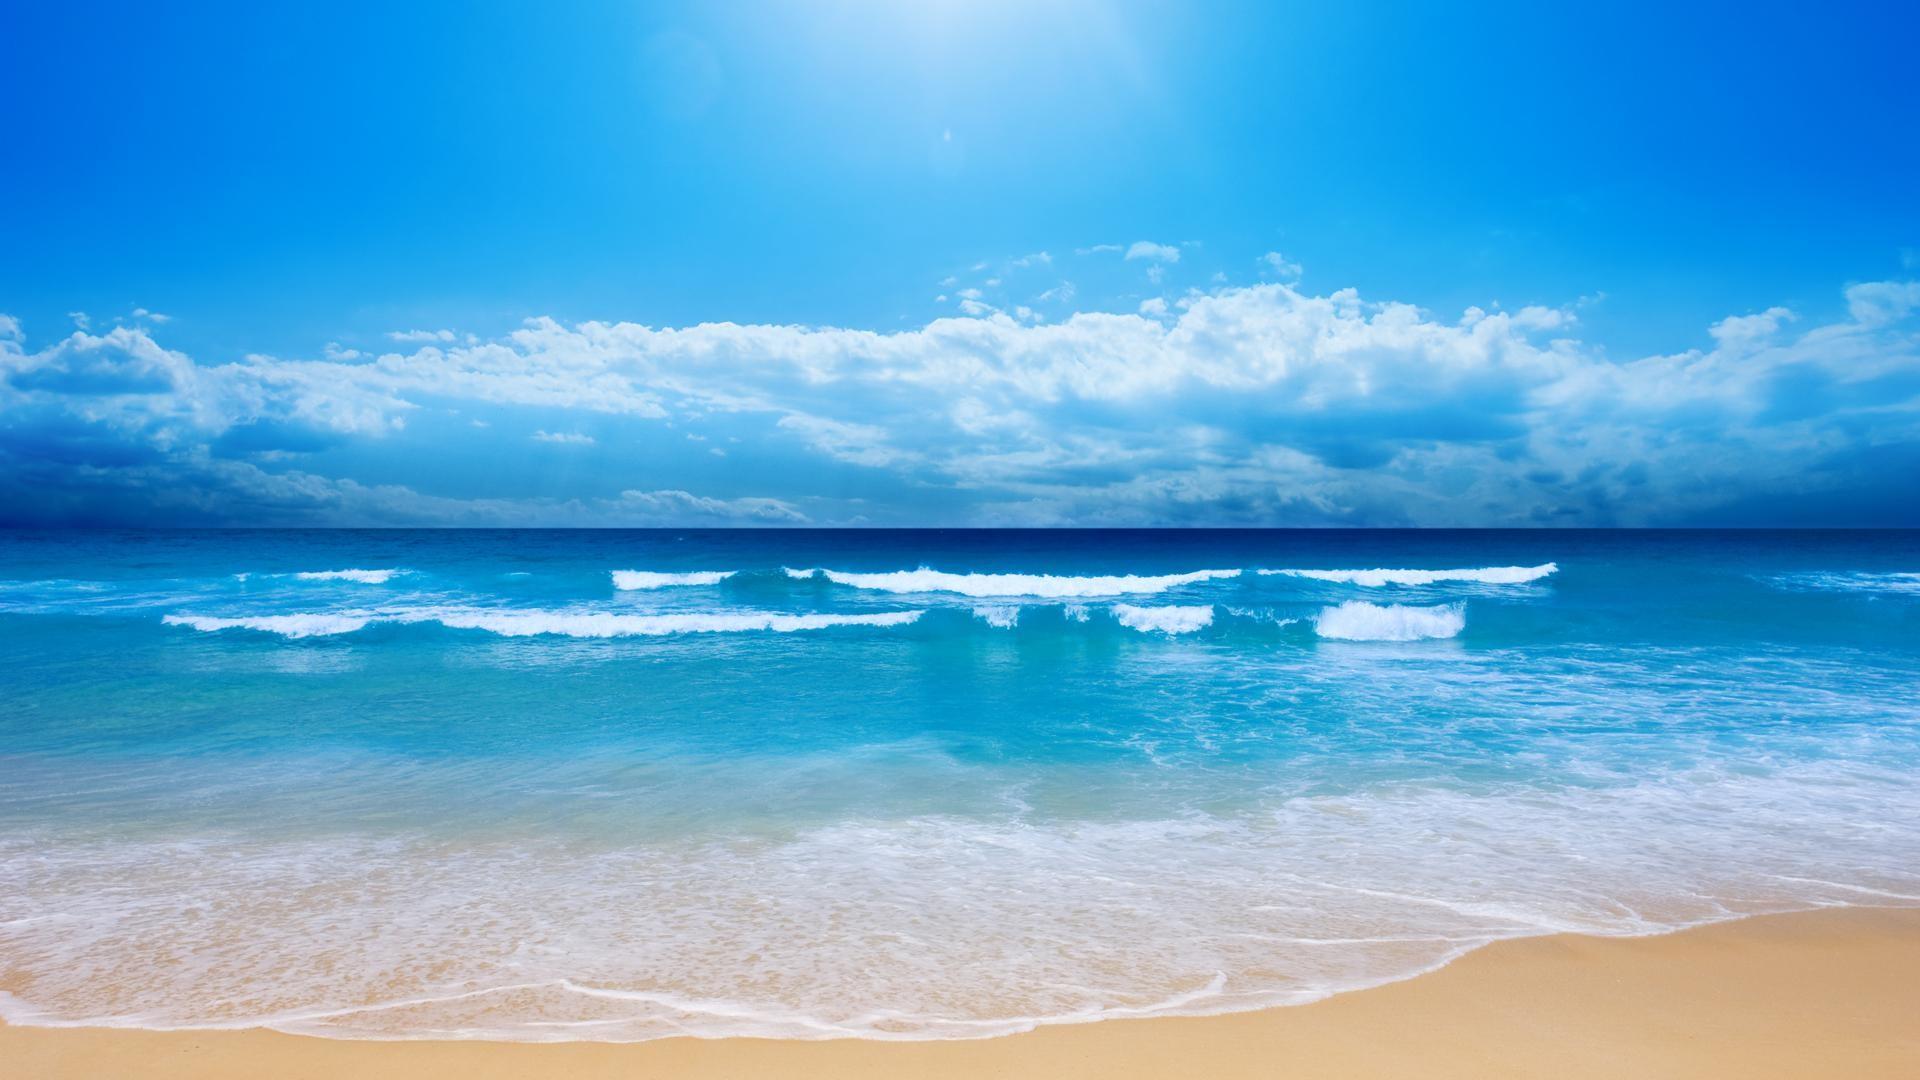 ocean, sun, sunshine, water, clouds, wow